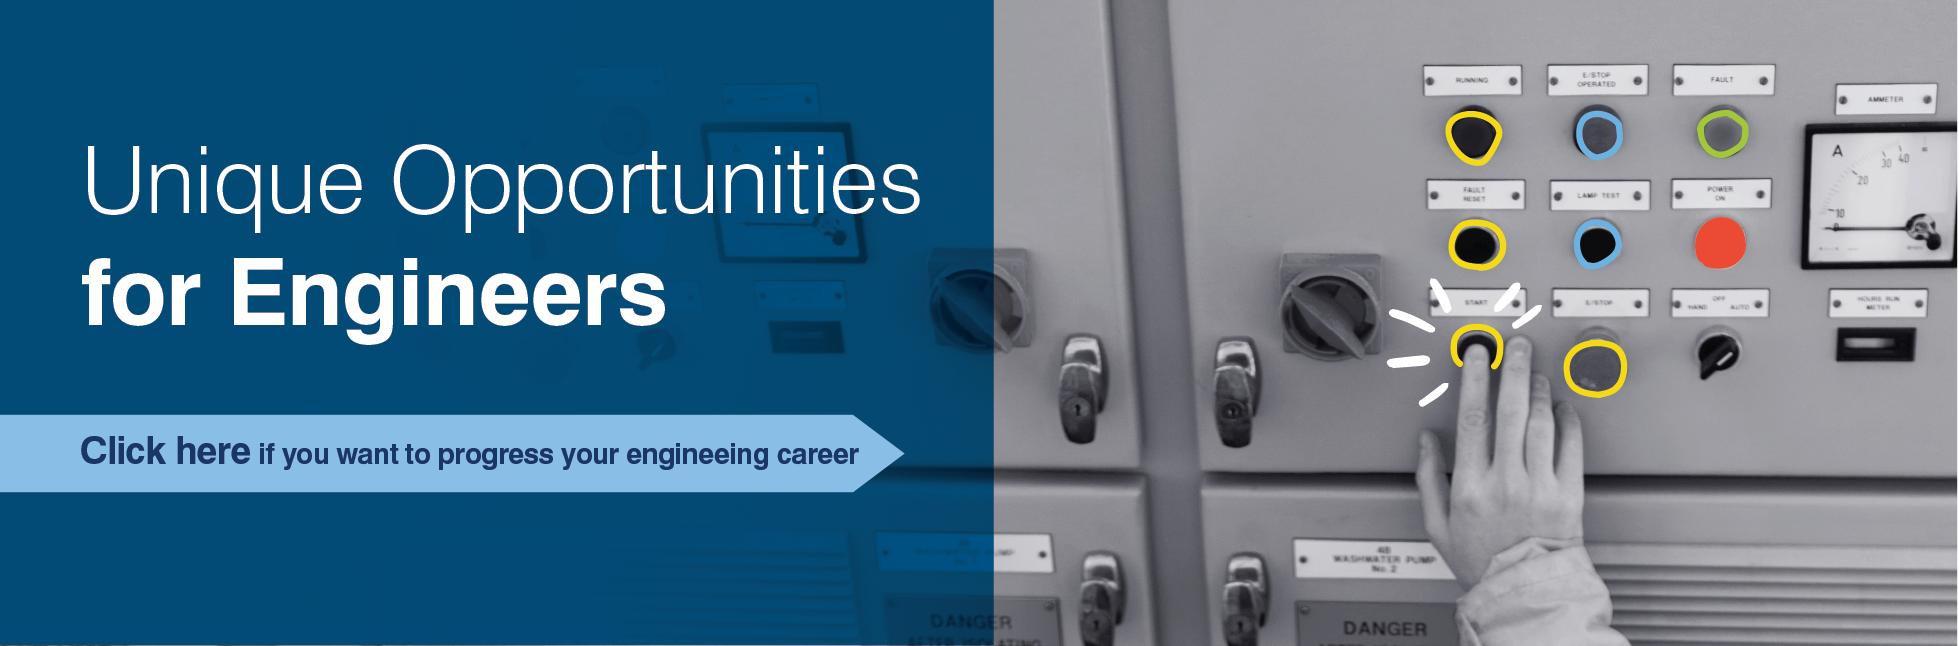 75734 -JW Recruitment Campaign – Engineering – JW website banner-01